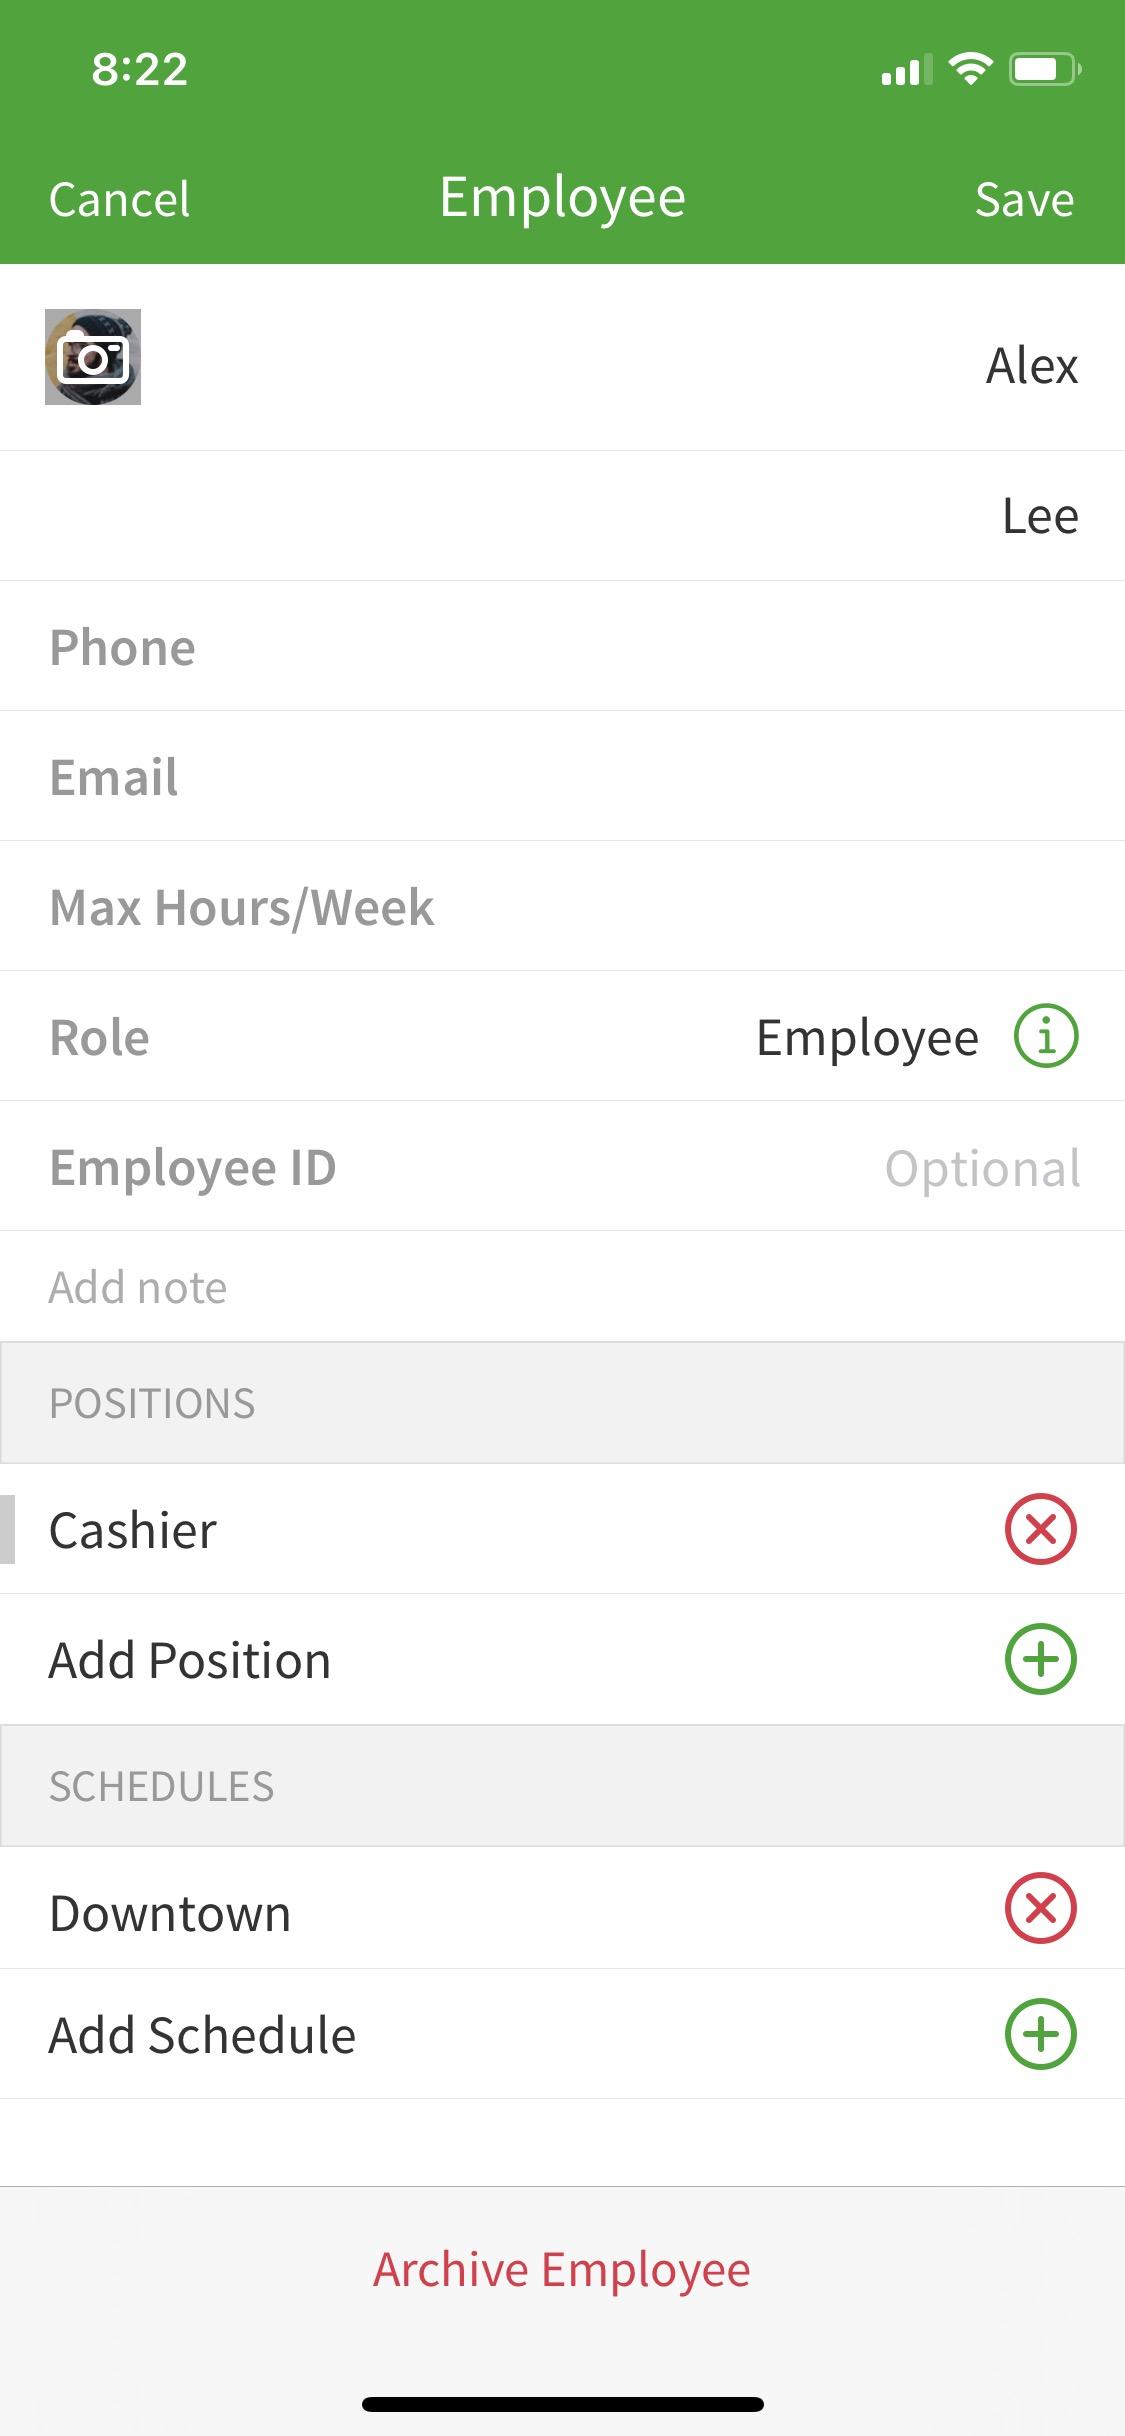 archive employee option